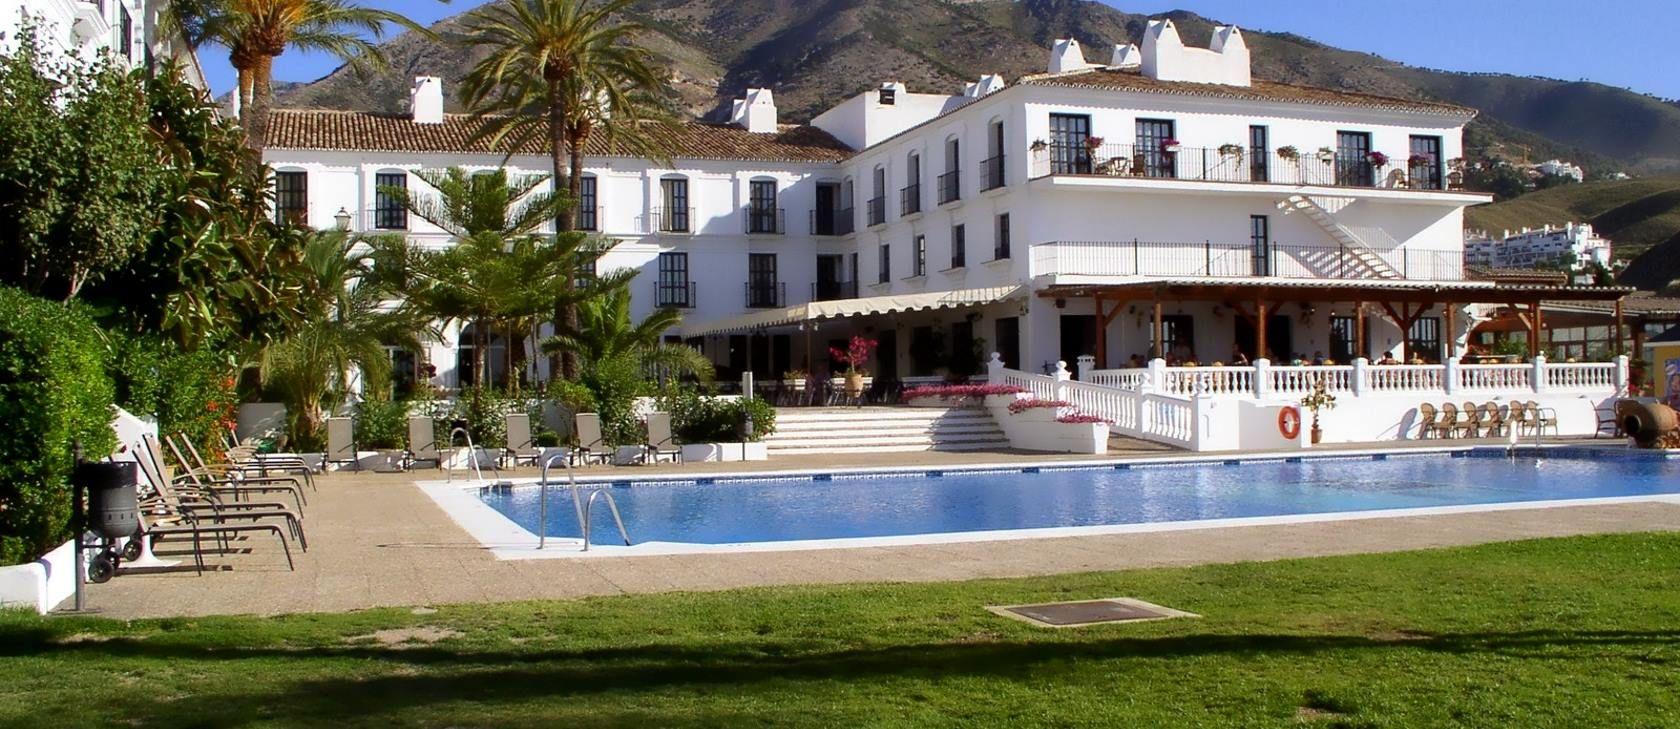 Piscina hotel hacienda puerta del sol mijas m laga - Hotel puerta del sol mijas ...